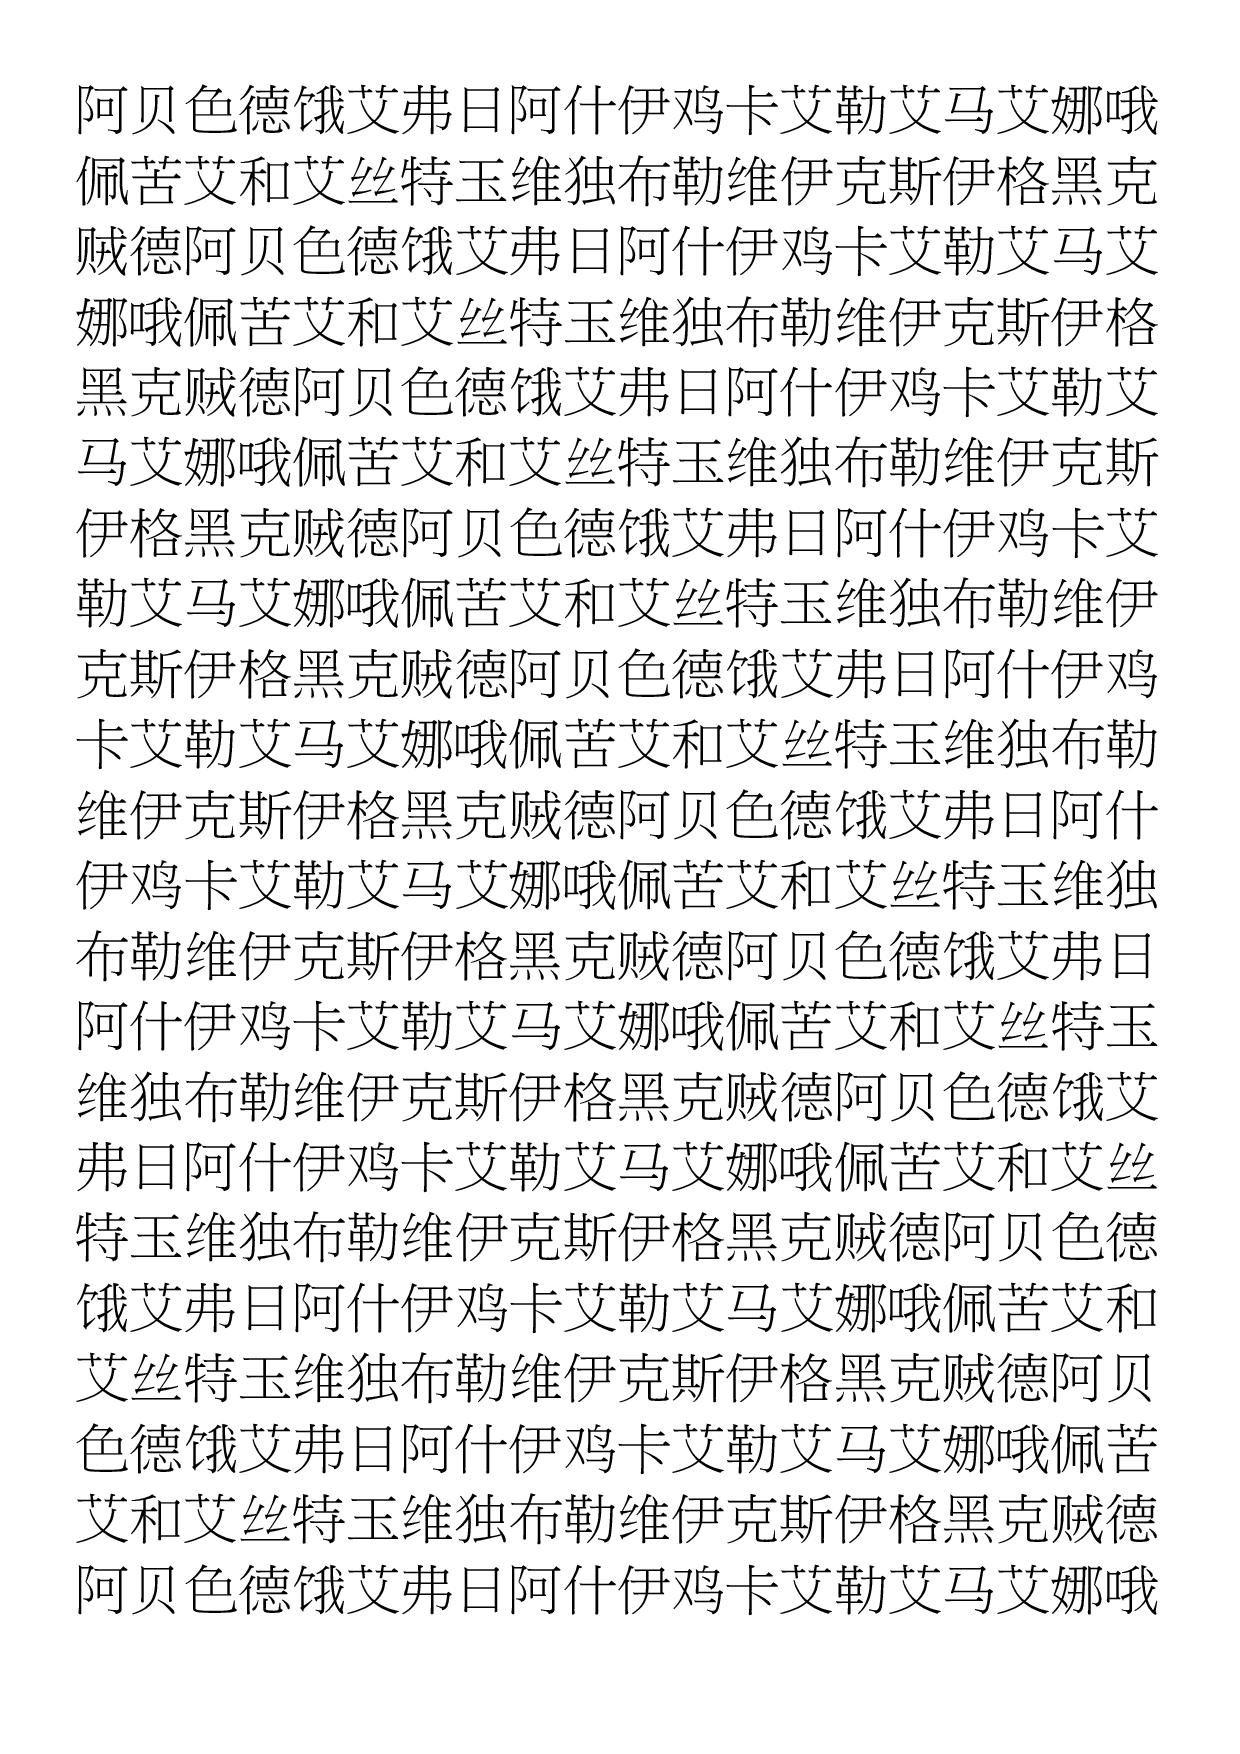 Tangram Chinois | Chine Maternelle tout Chanson De Noel En Chinois